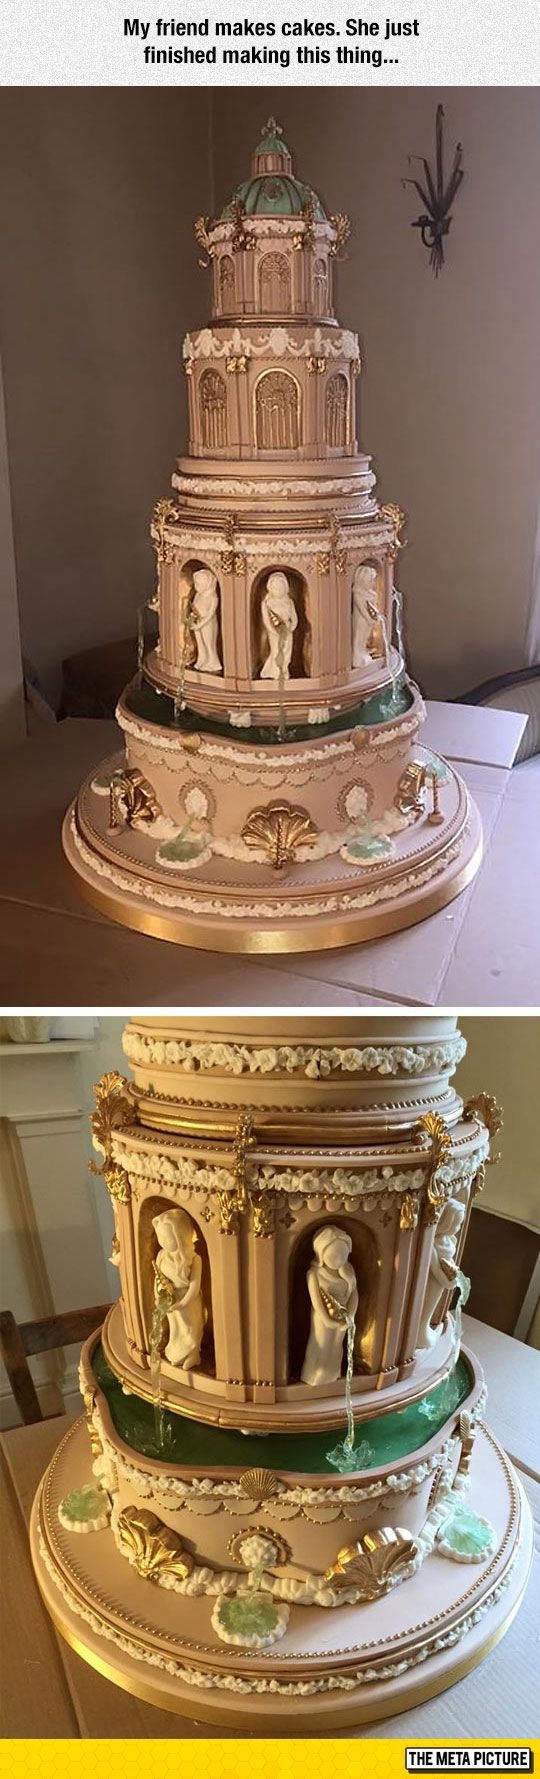 Edible Art, Cake.